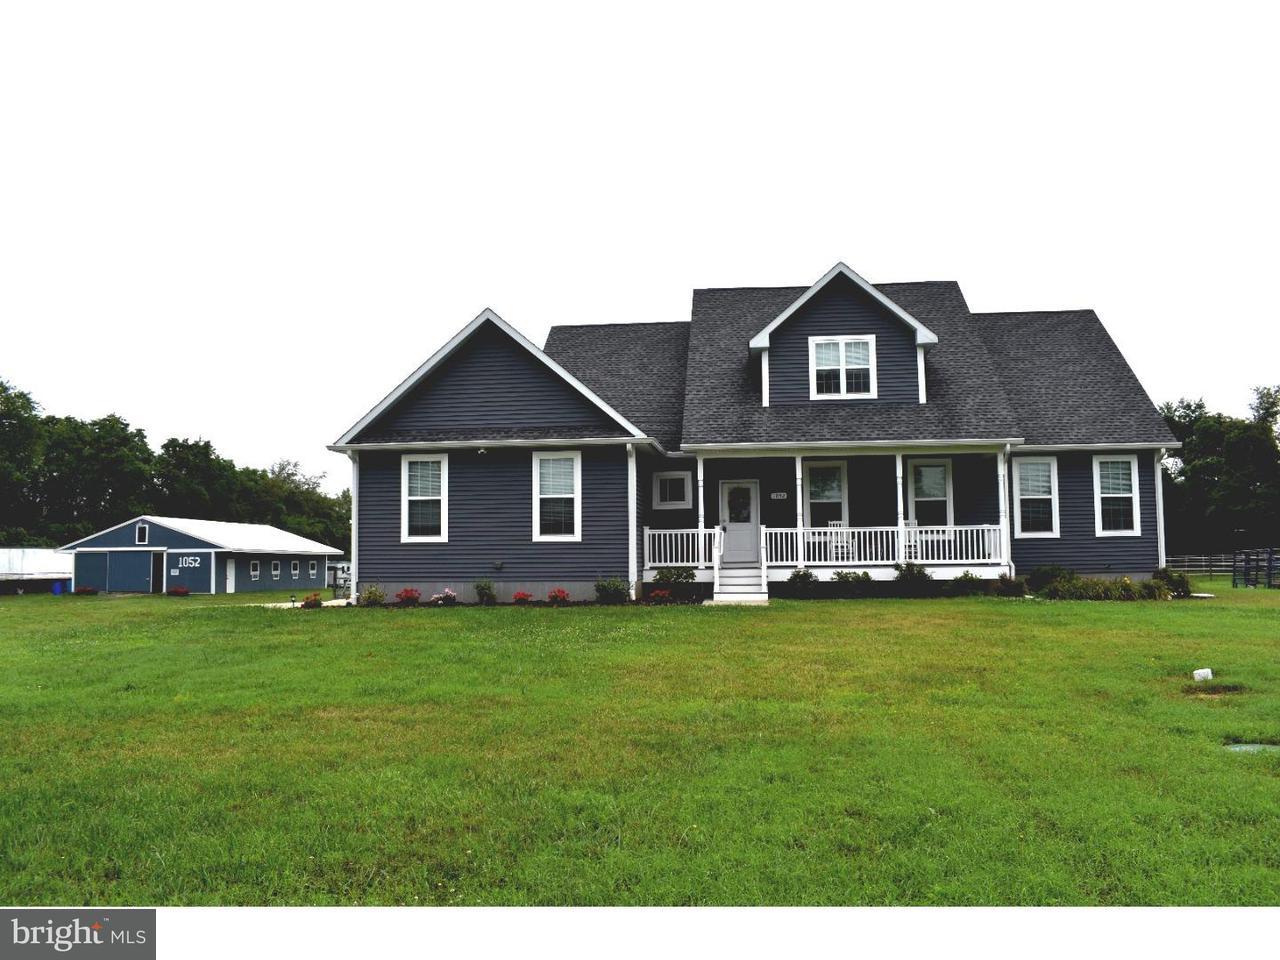 独户住宅 为 销售 在 1052 OLD WHITE HORSE PIKE Waterford Works, 新泽西州 08089 美国